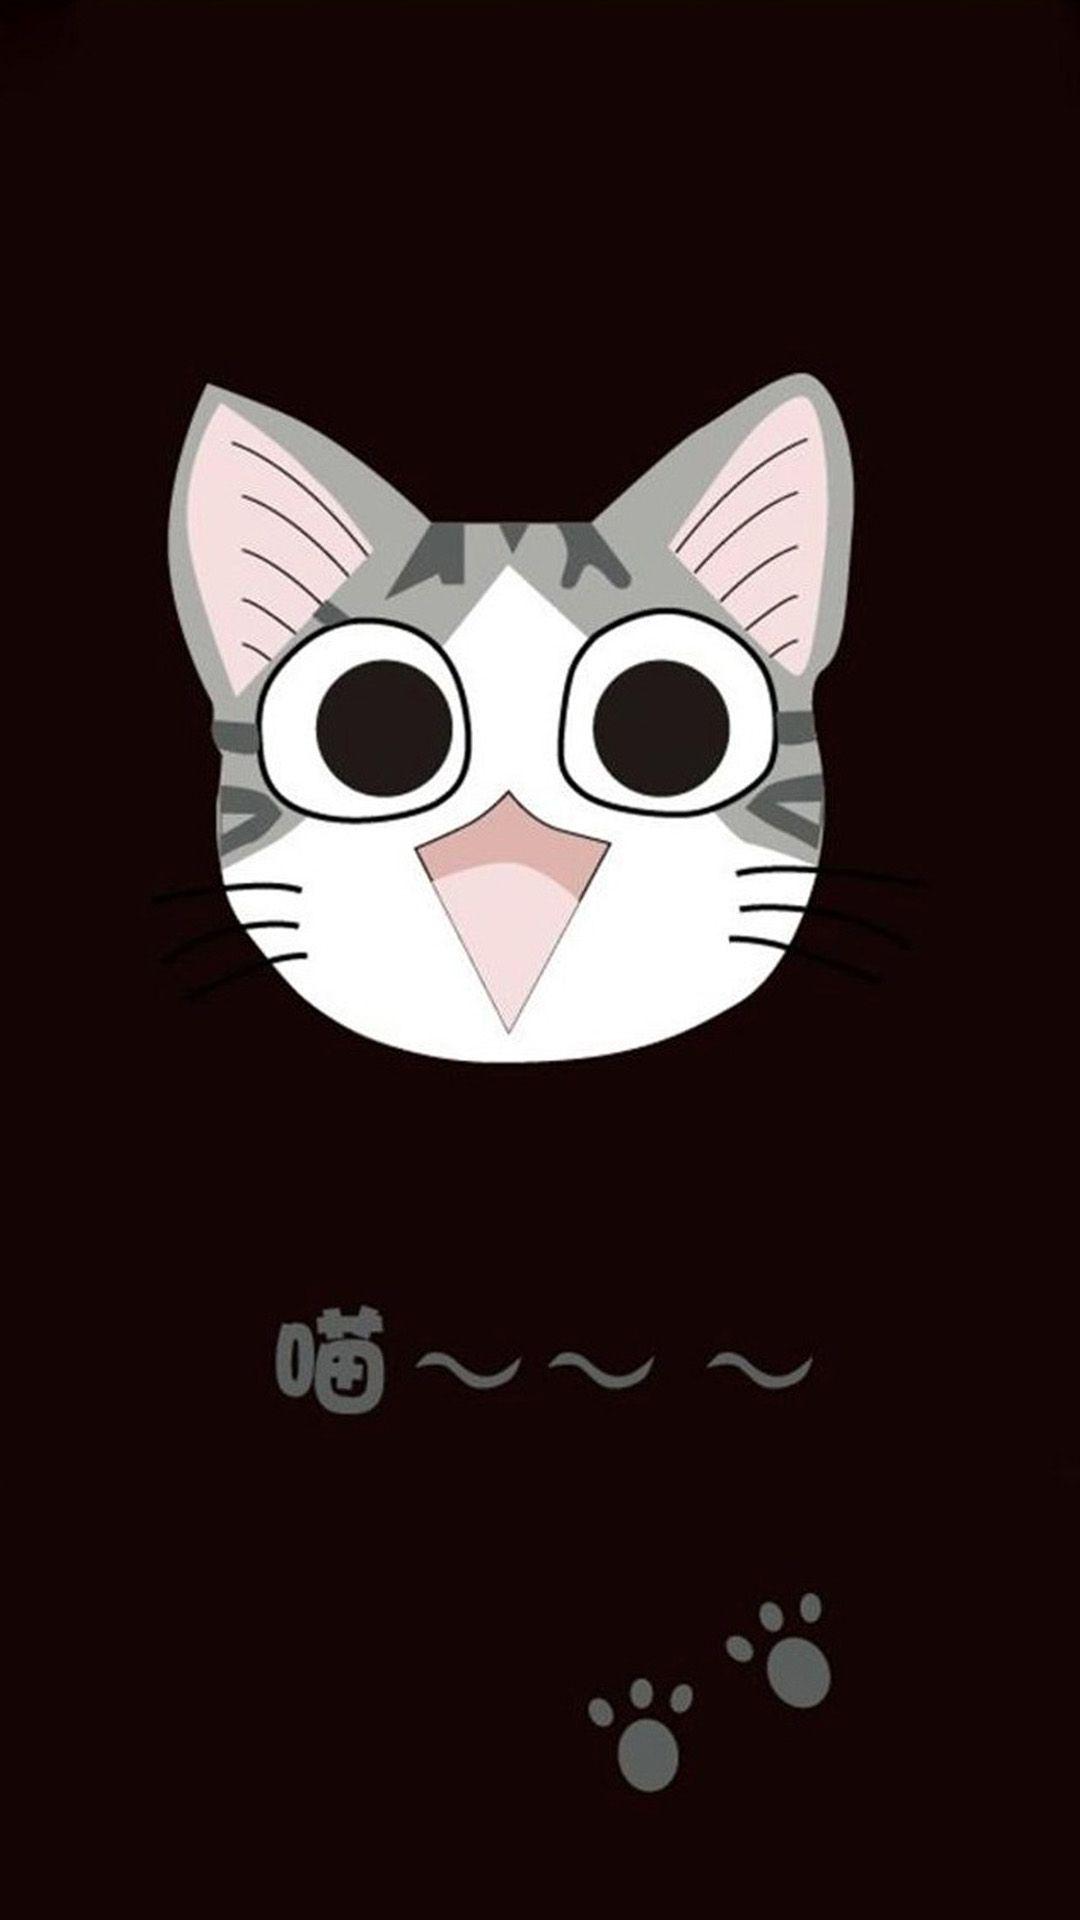 Cute Cartoon Cat Wallpaper Wallpapersafari Milye Oboi Oboi